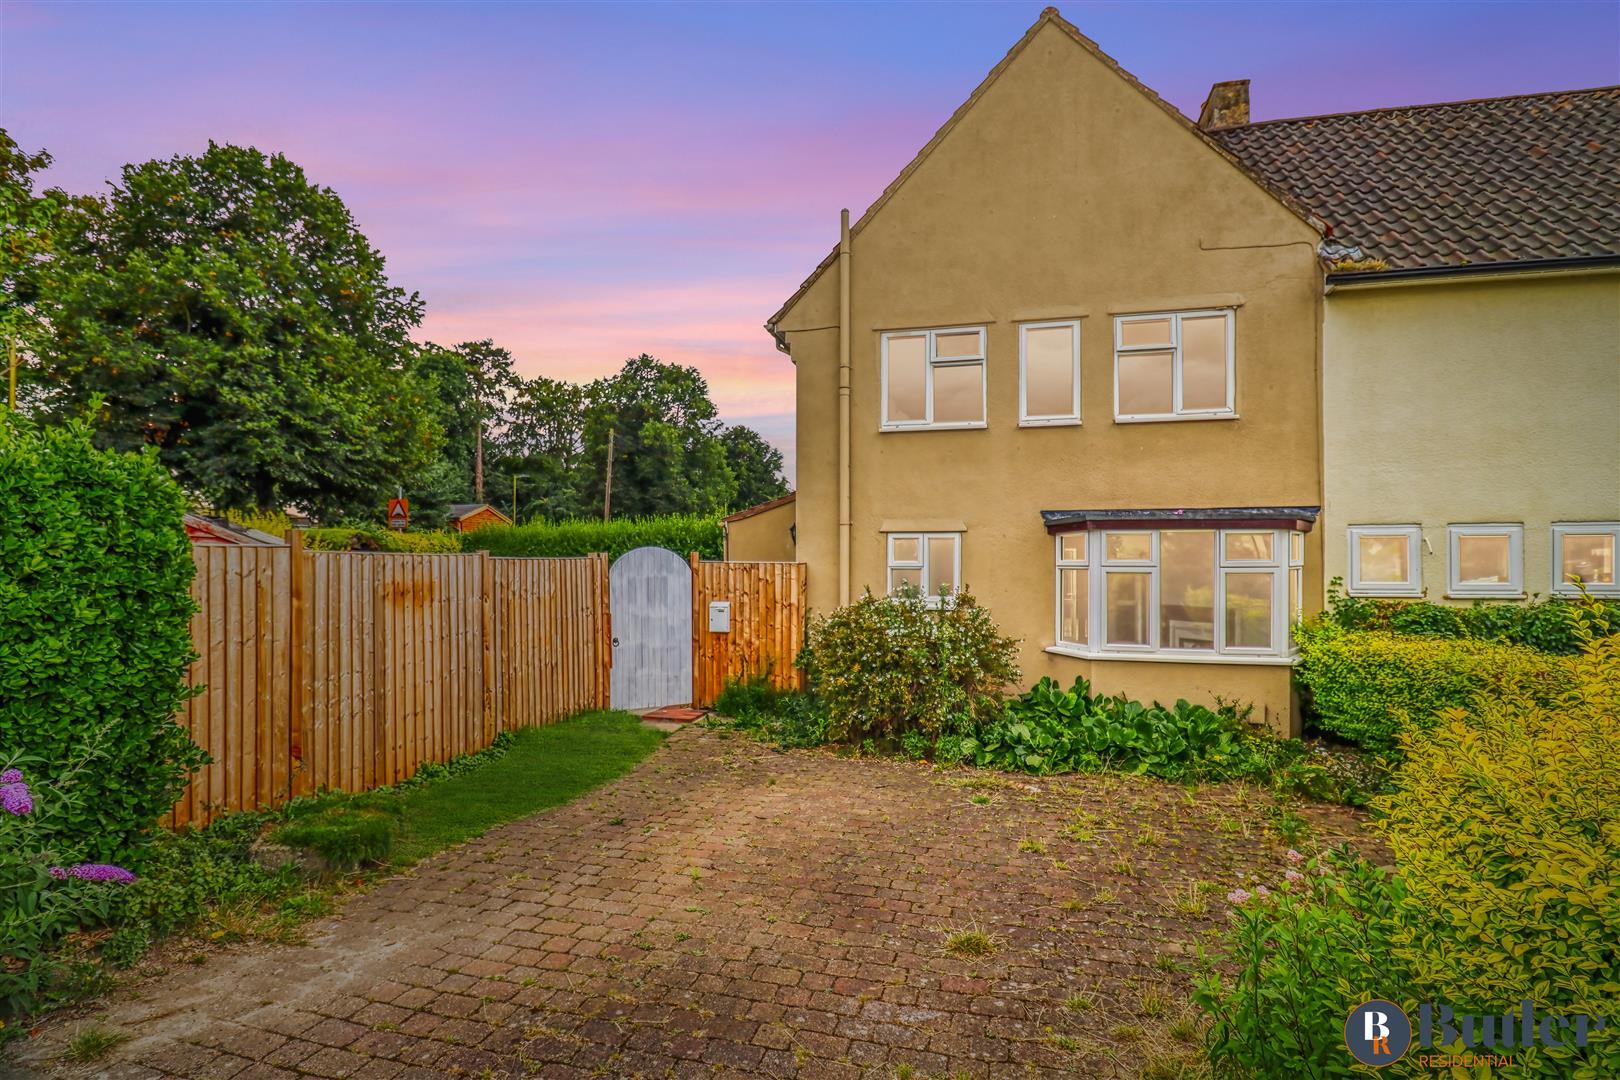 3 bed semi-detached house for sale in Weston Way, Baldock, SG7